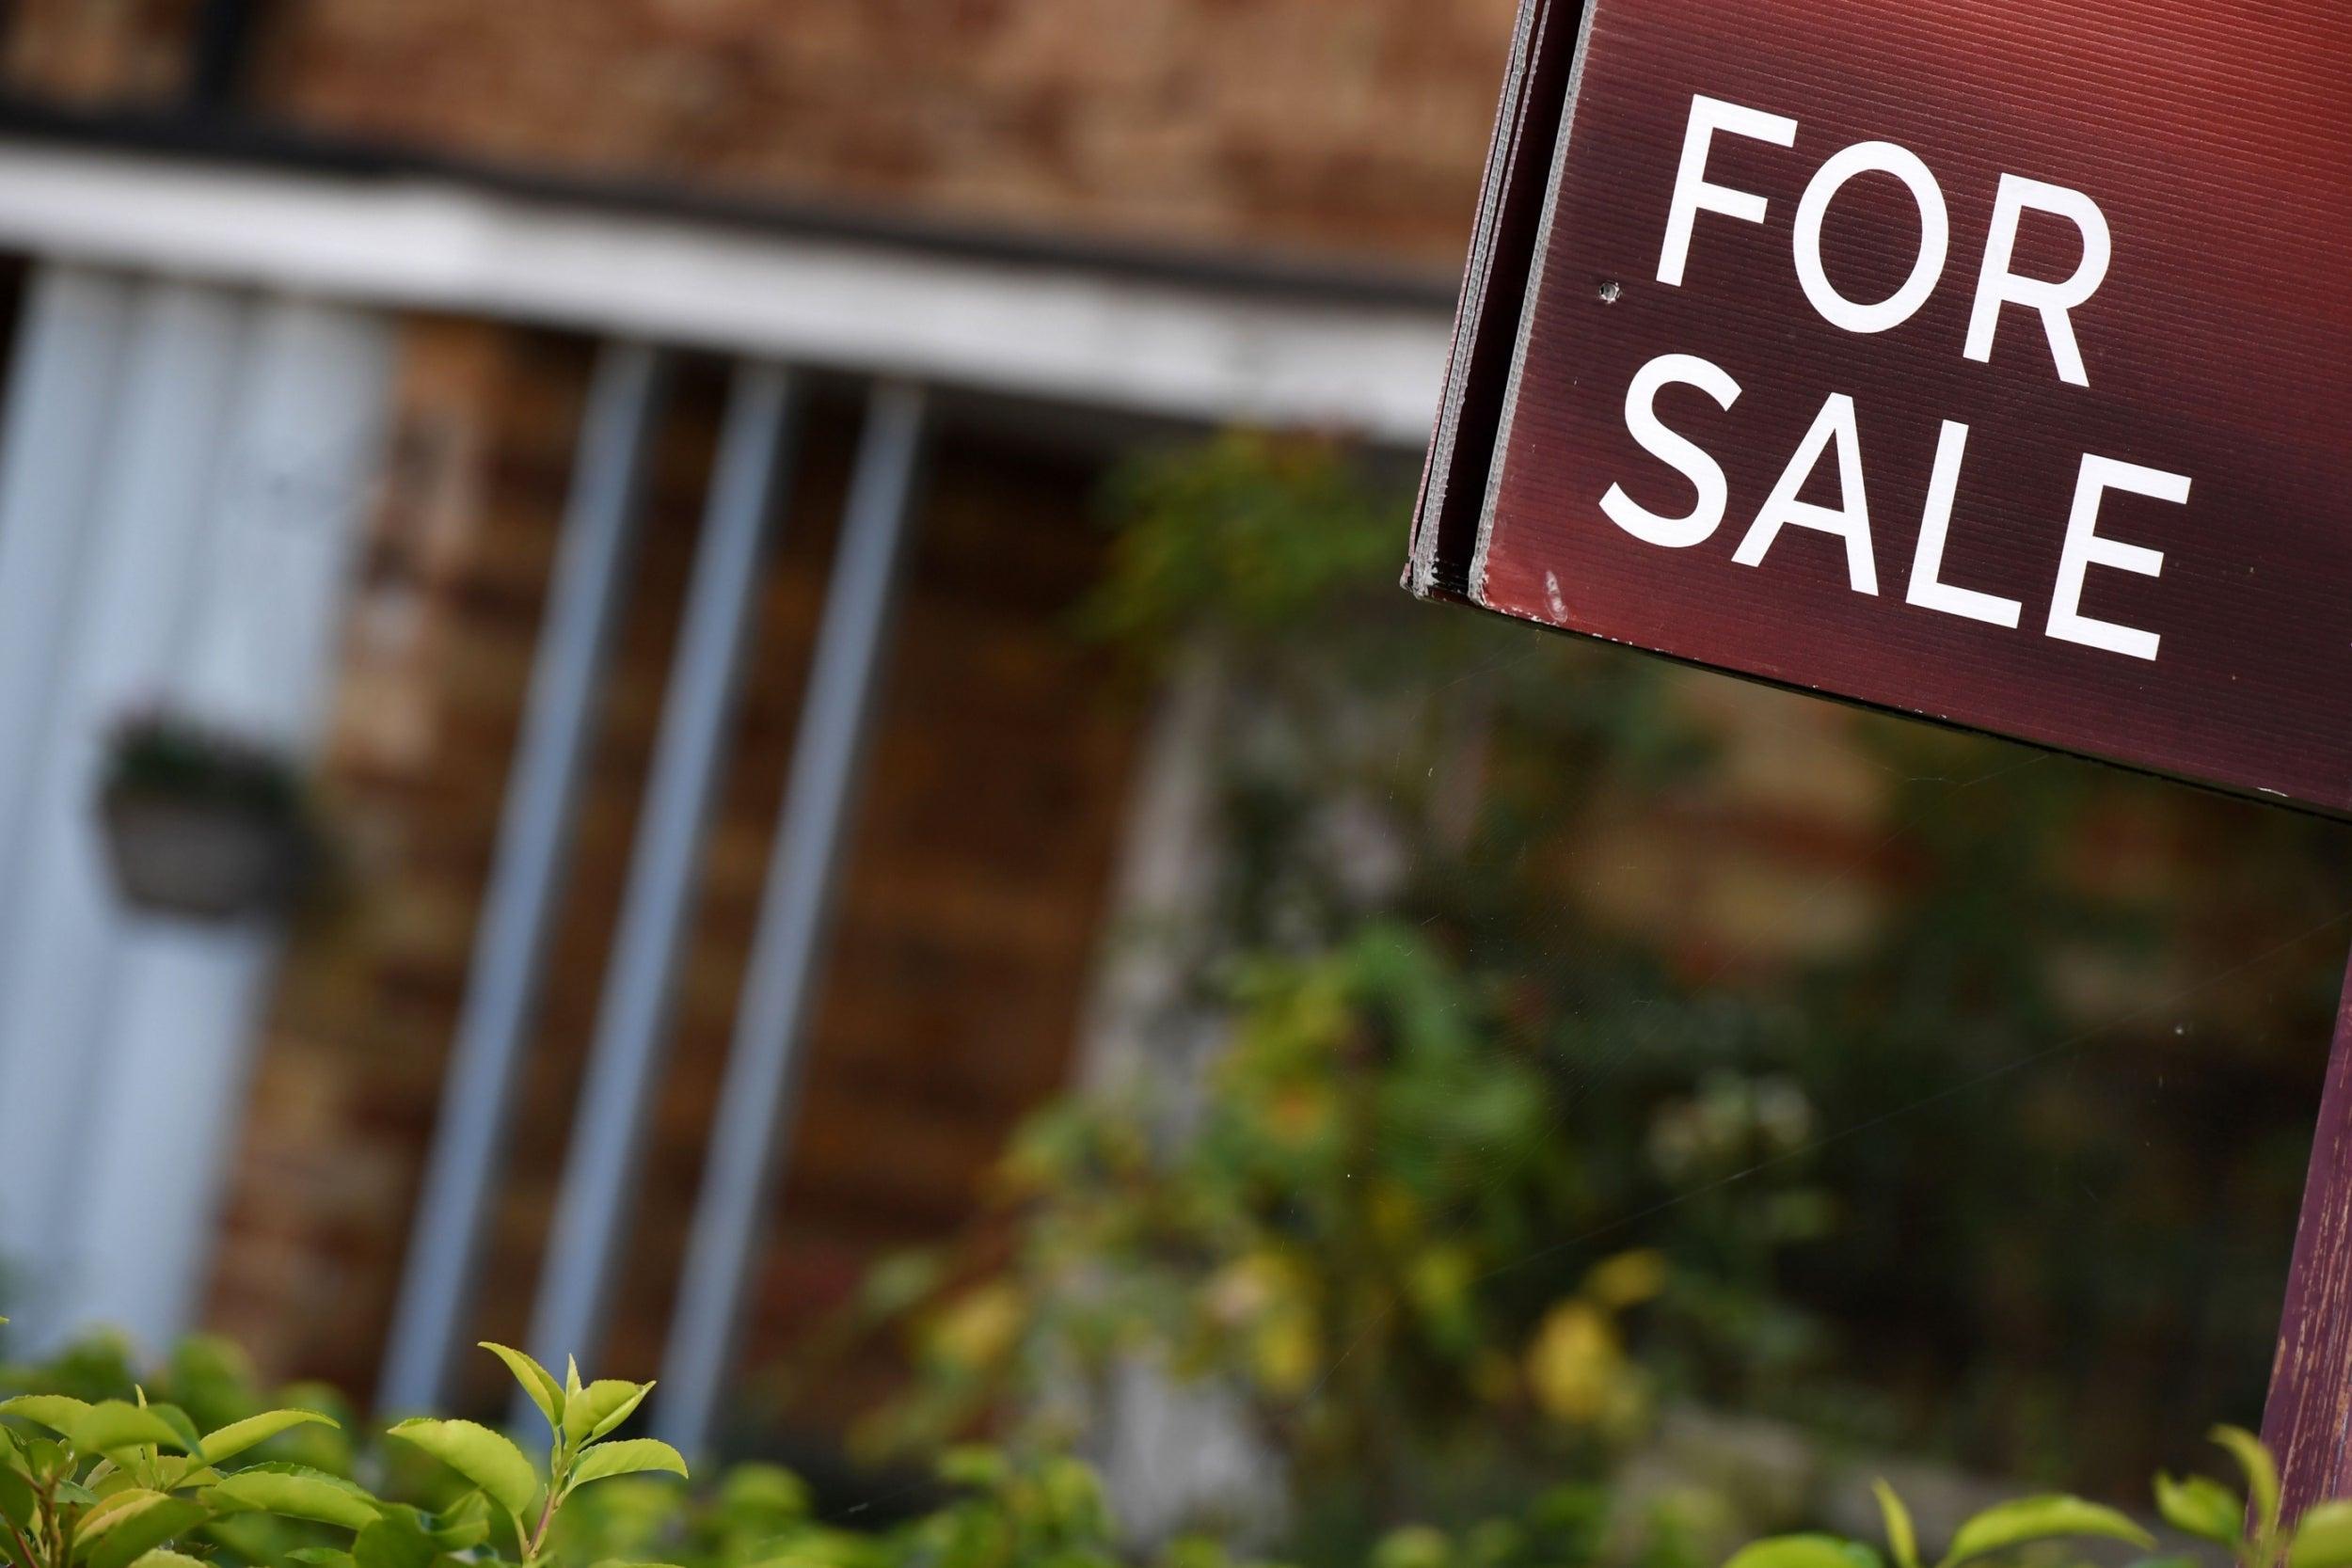 Nationwide triples minimum mortgage deposits amid fears of house price slump